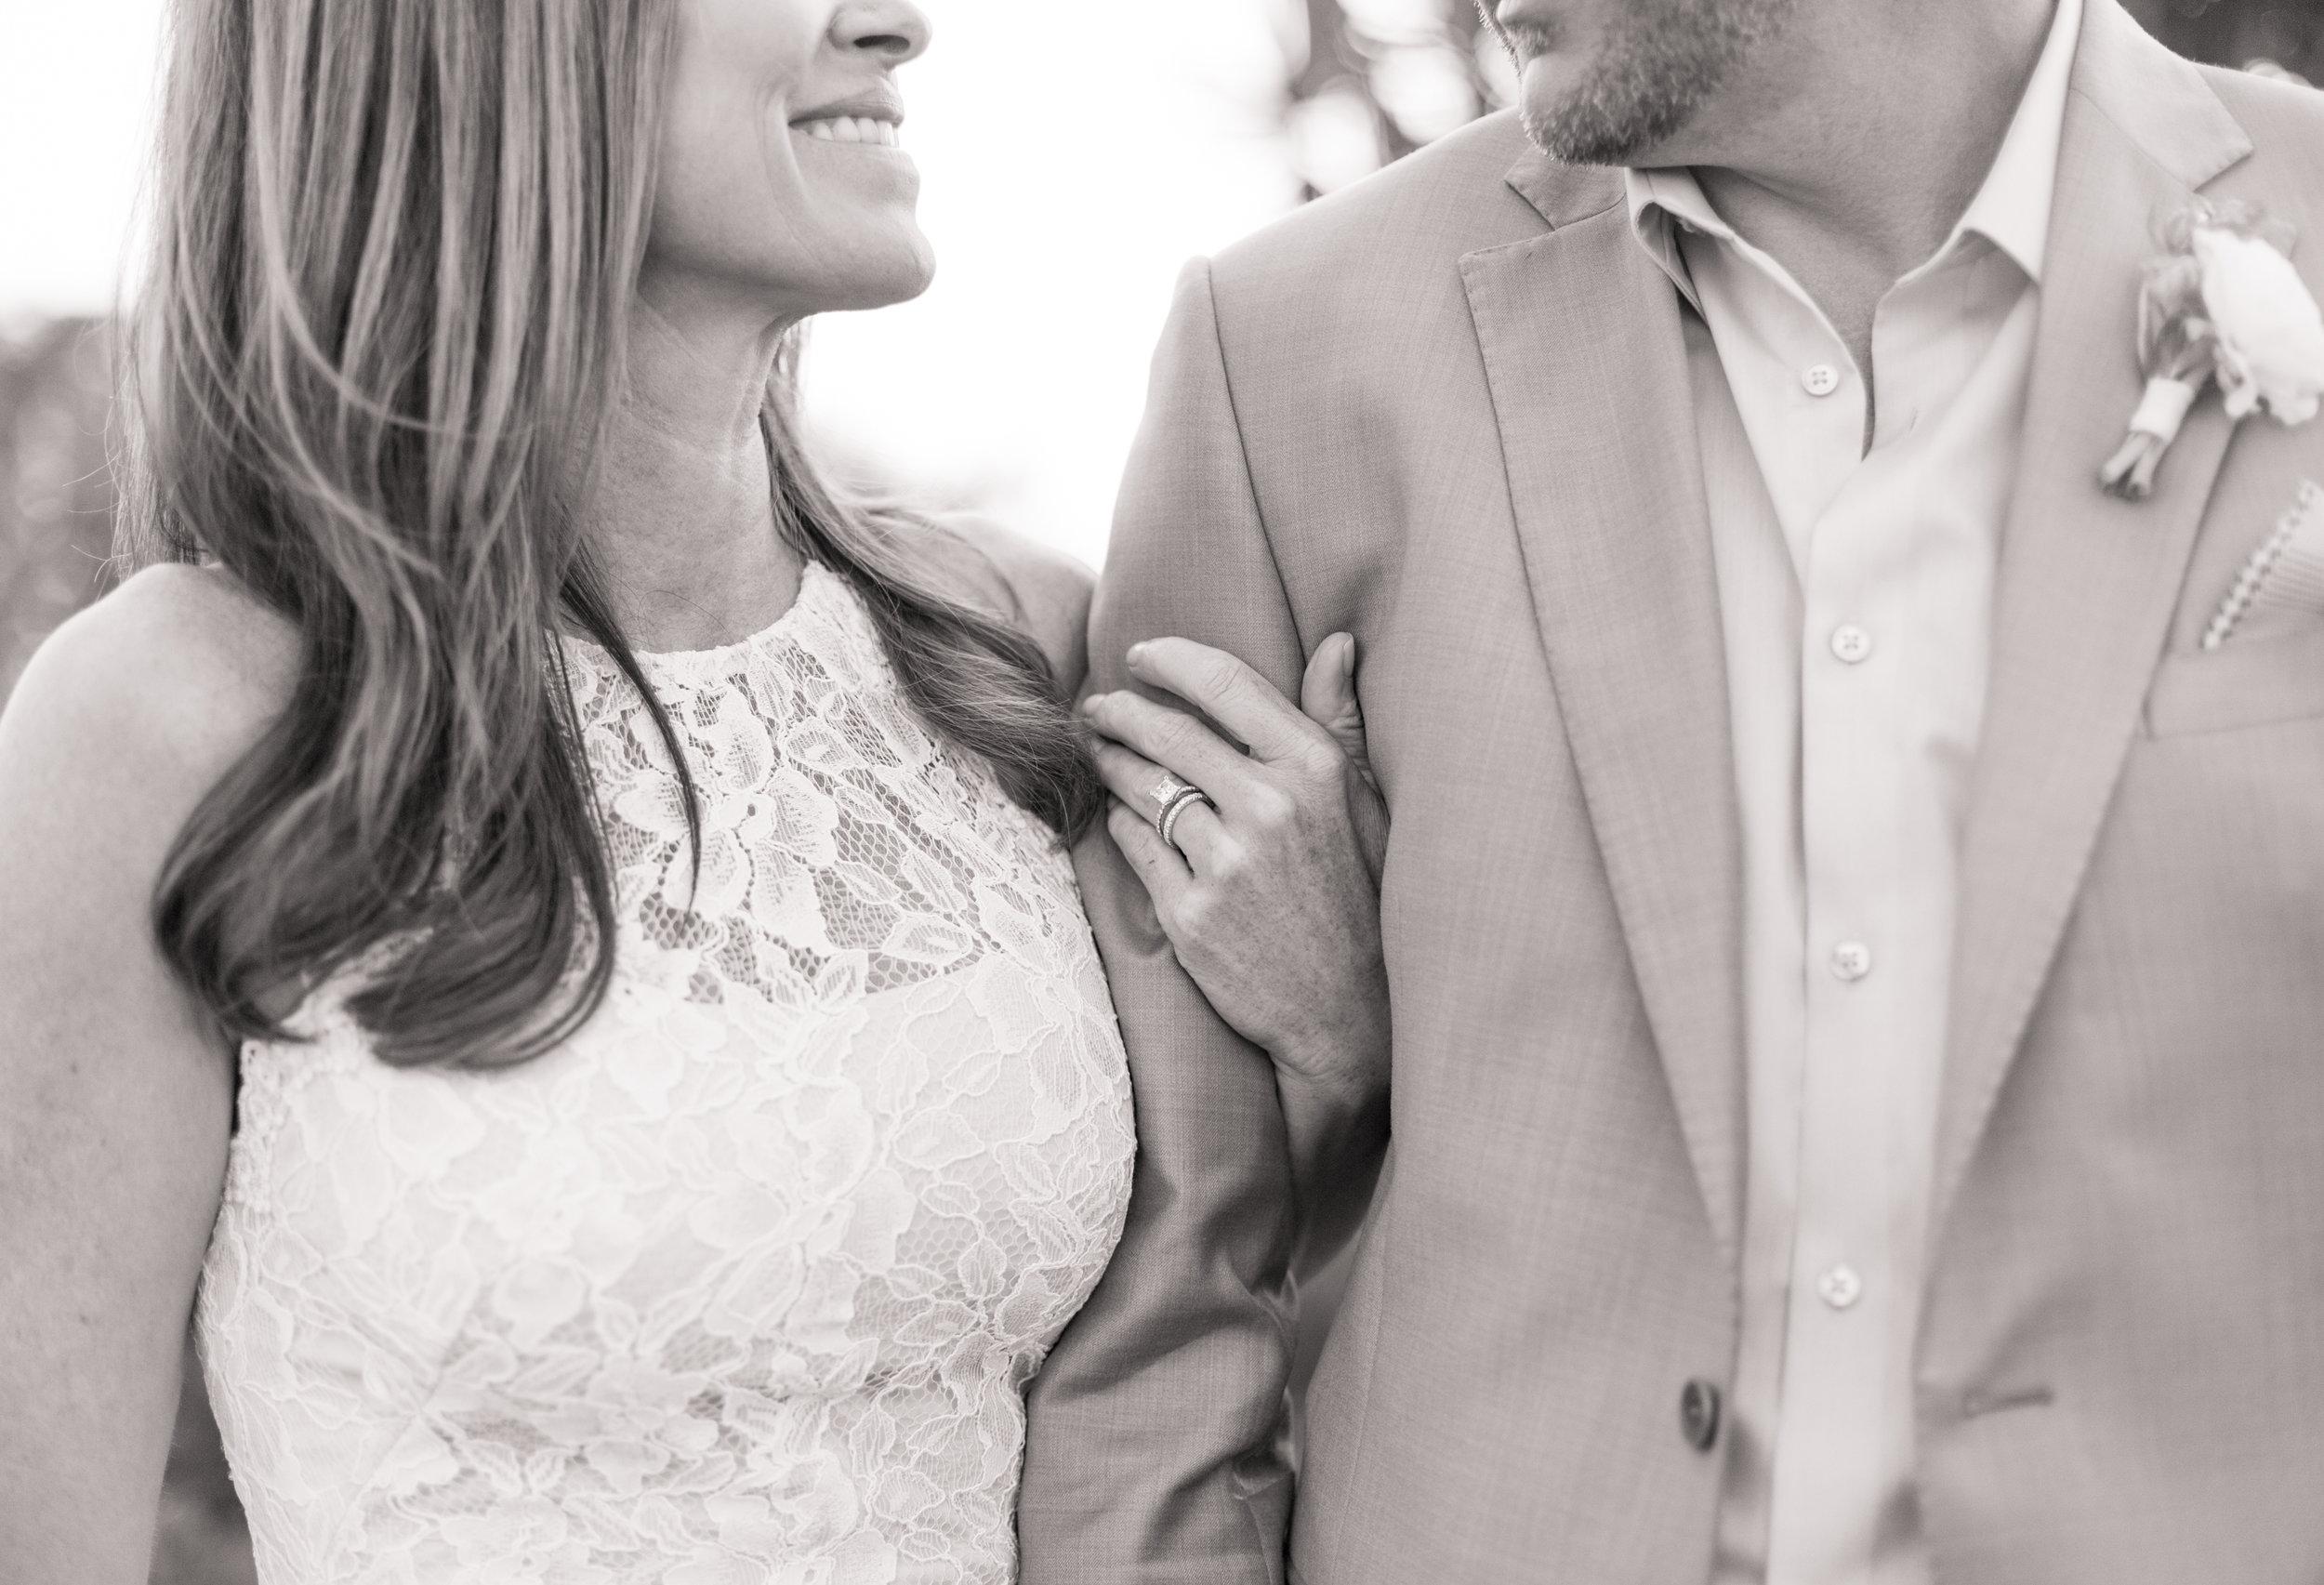 santa-barbara-elopement-elope-wedding-planner-coordinator-coordination-day-of-intimate-rustic-ellwood-bluffs-forest-beach-ocean-view-green-white-event (17).jpg